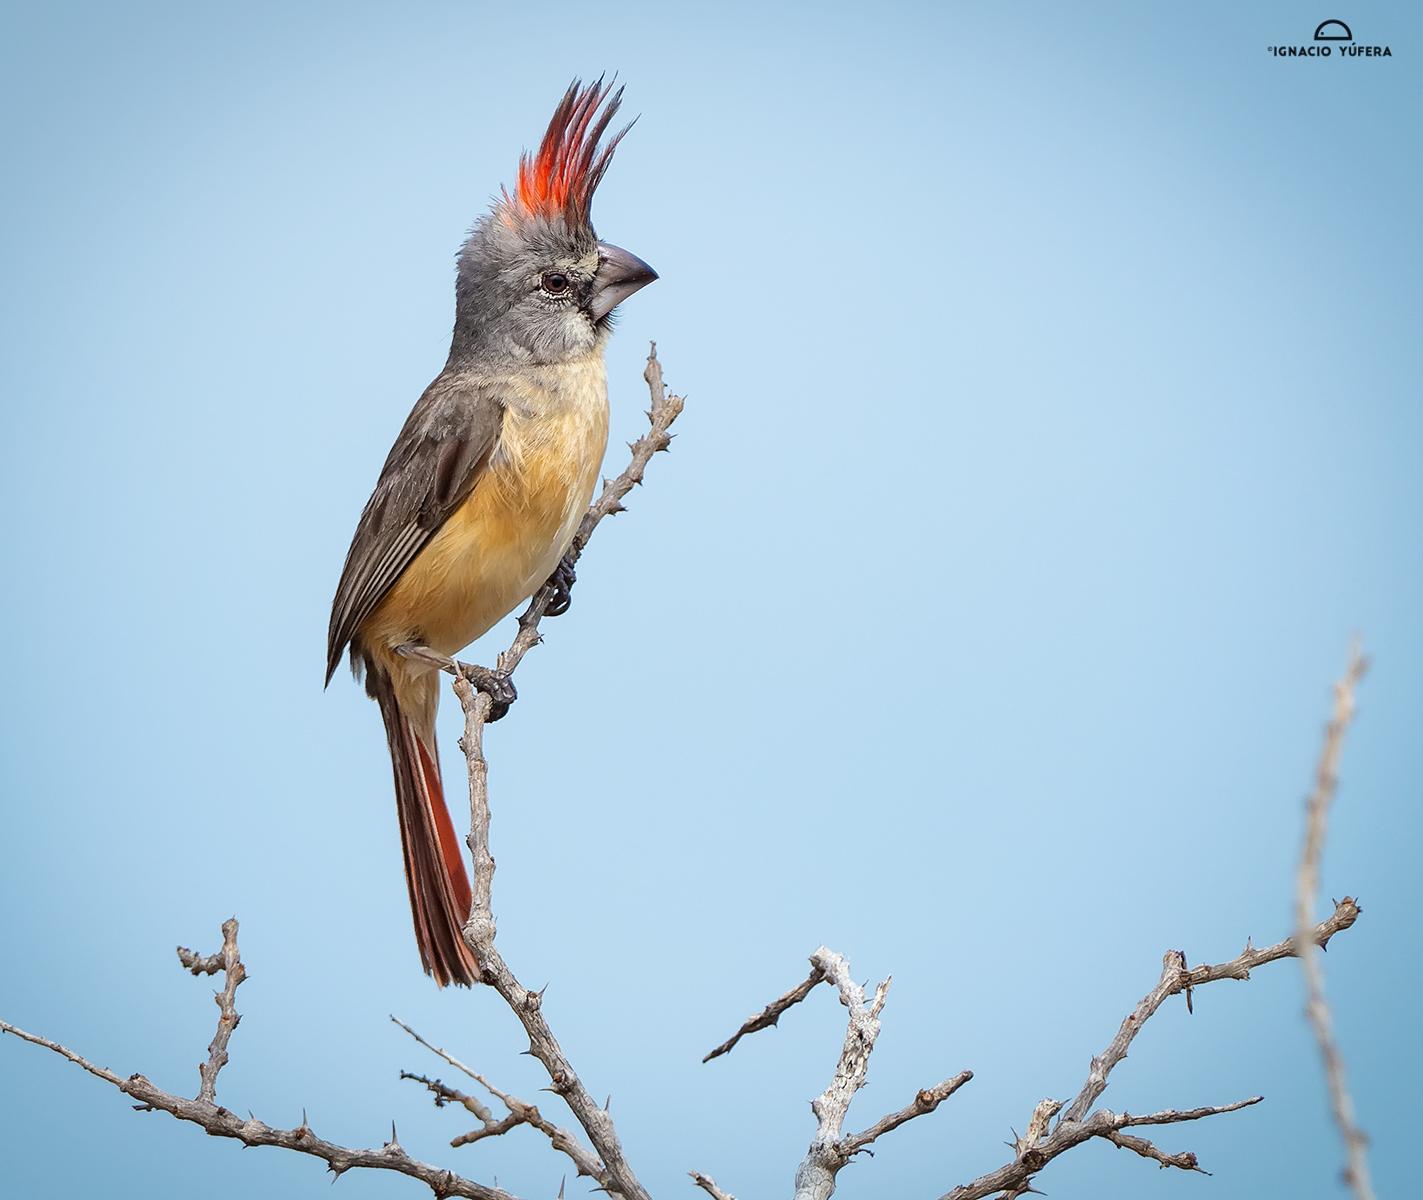 Vermilion Cardinal (Cardinalis phoeniceus), female, La Guajira, Colombia